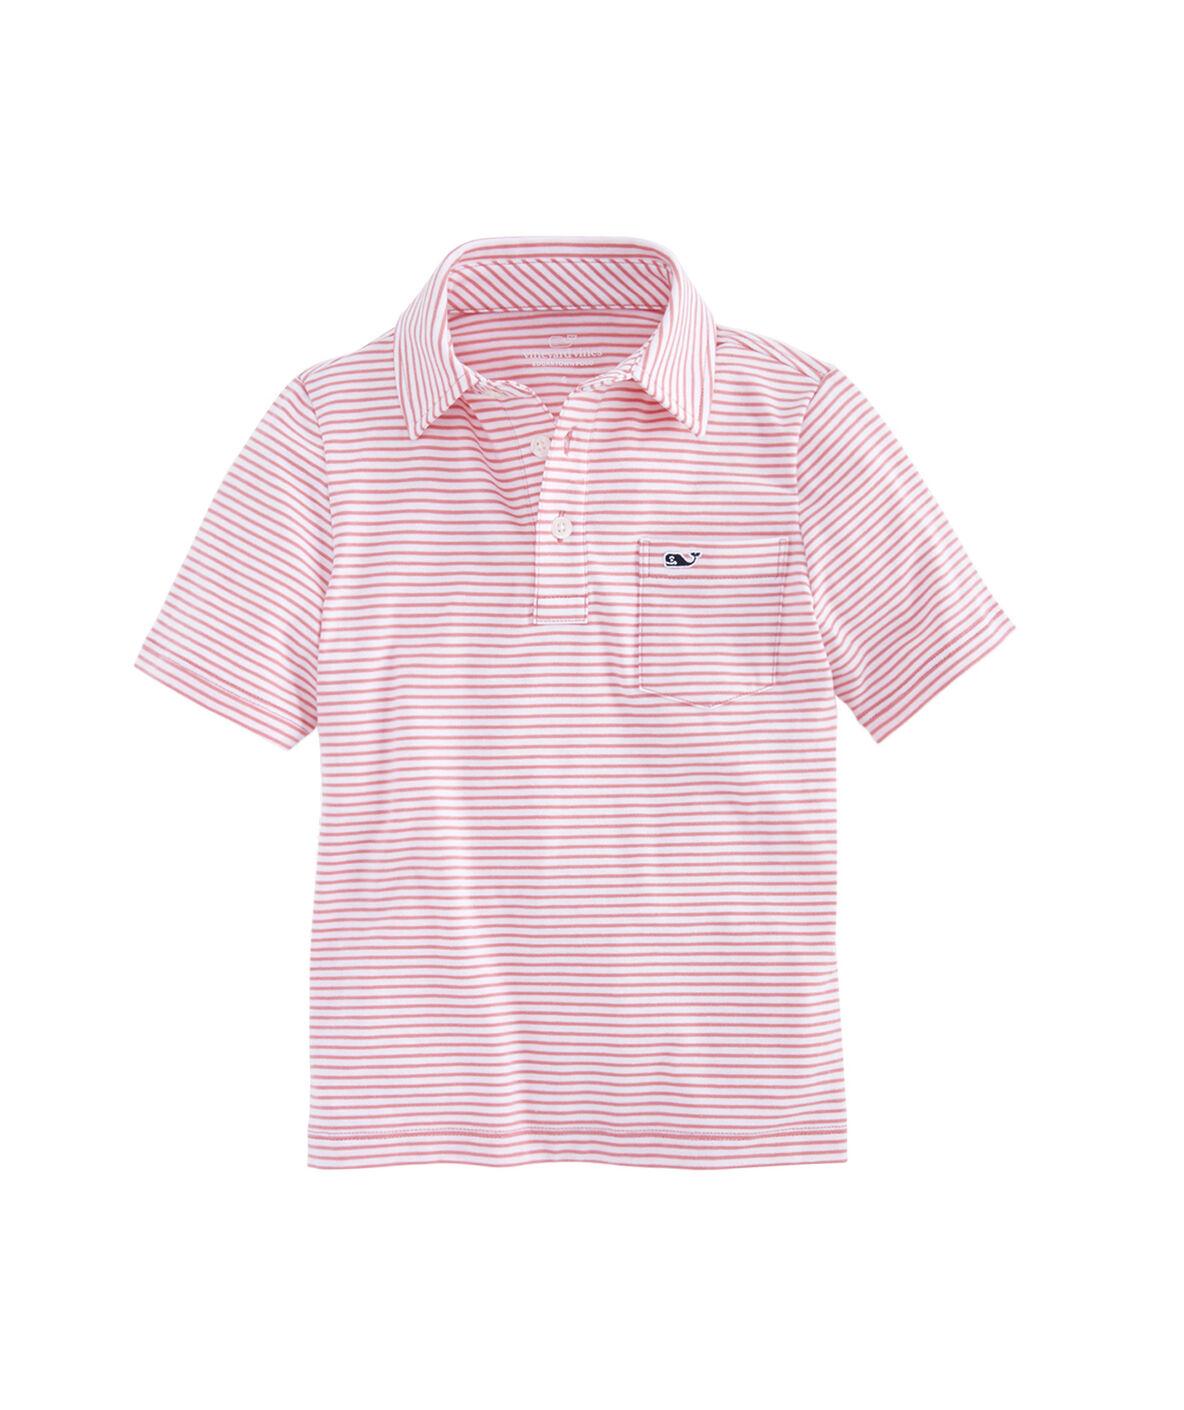 Pink Baby Boy Polo Shirt Bcd Tofu House